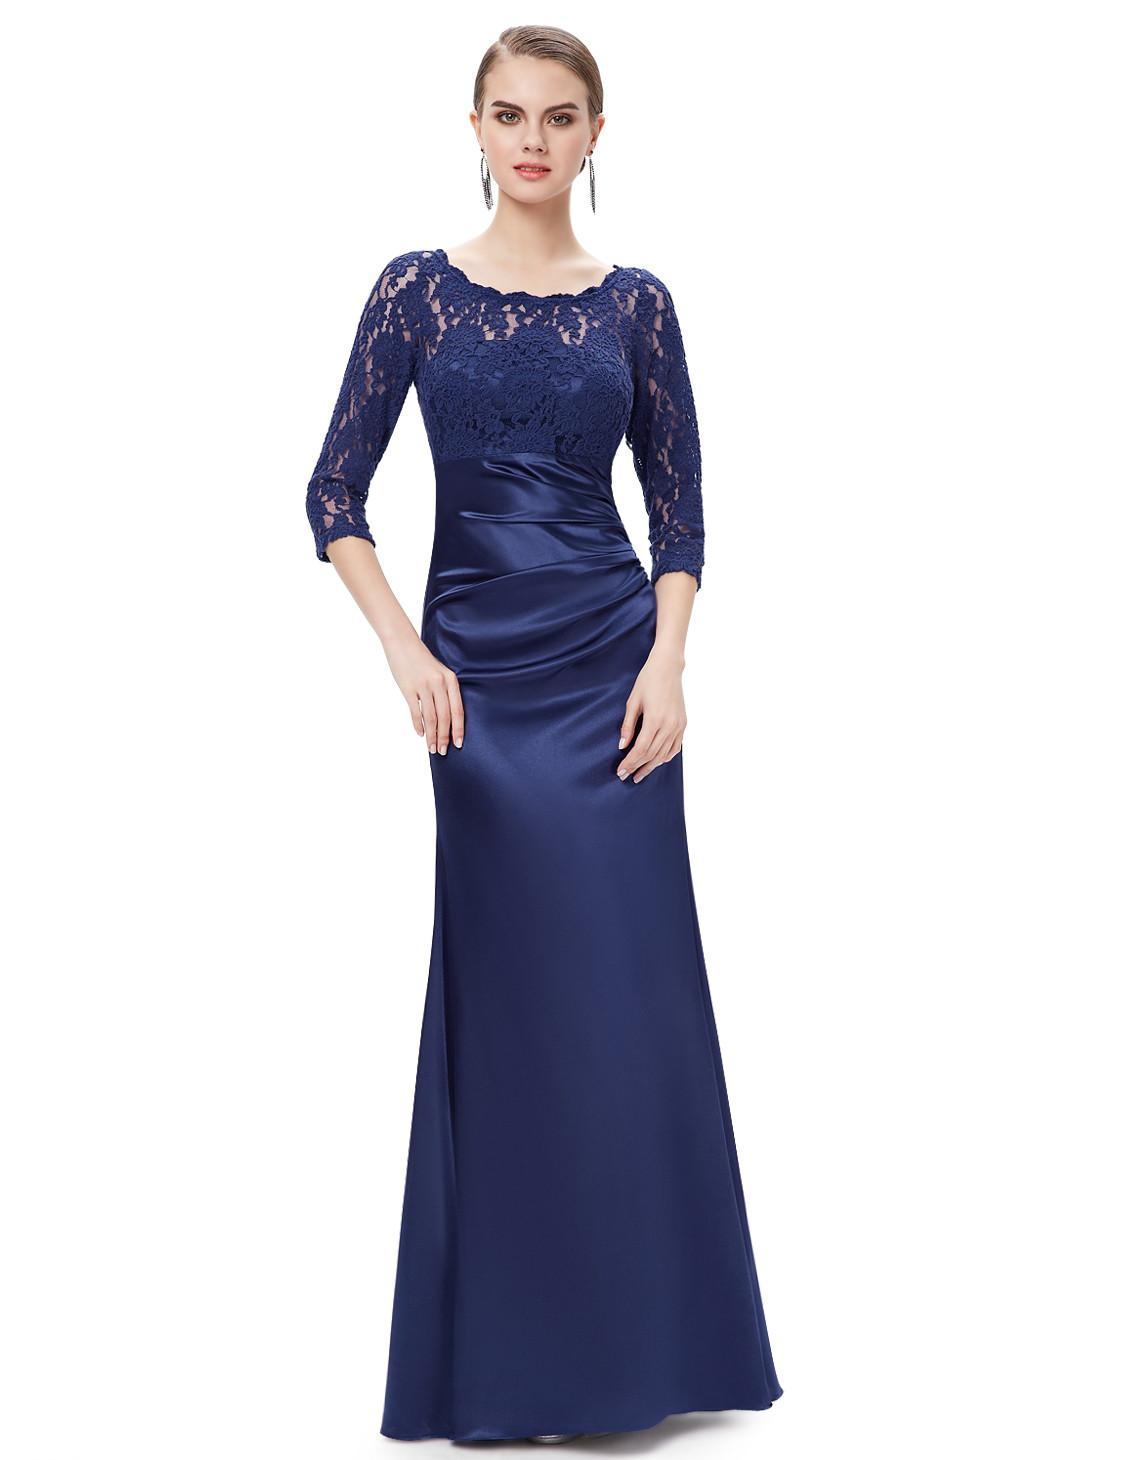 Elegant Navy blue Lace Long Sleeve Bridesmaid Dress